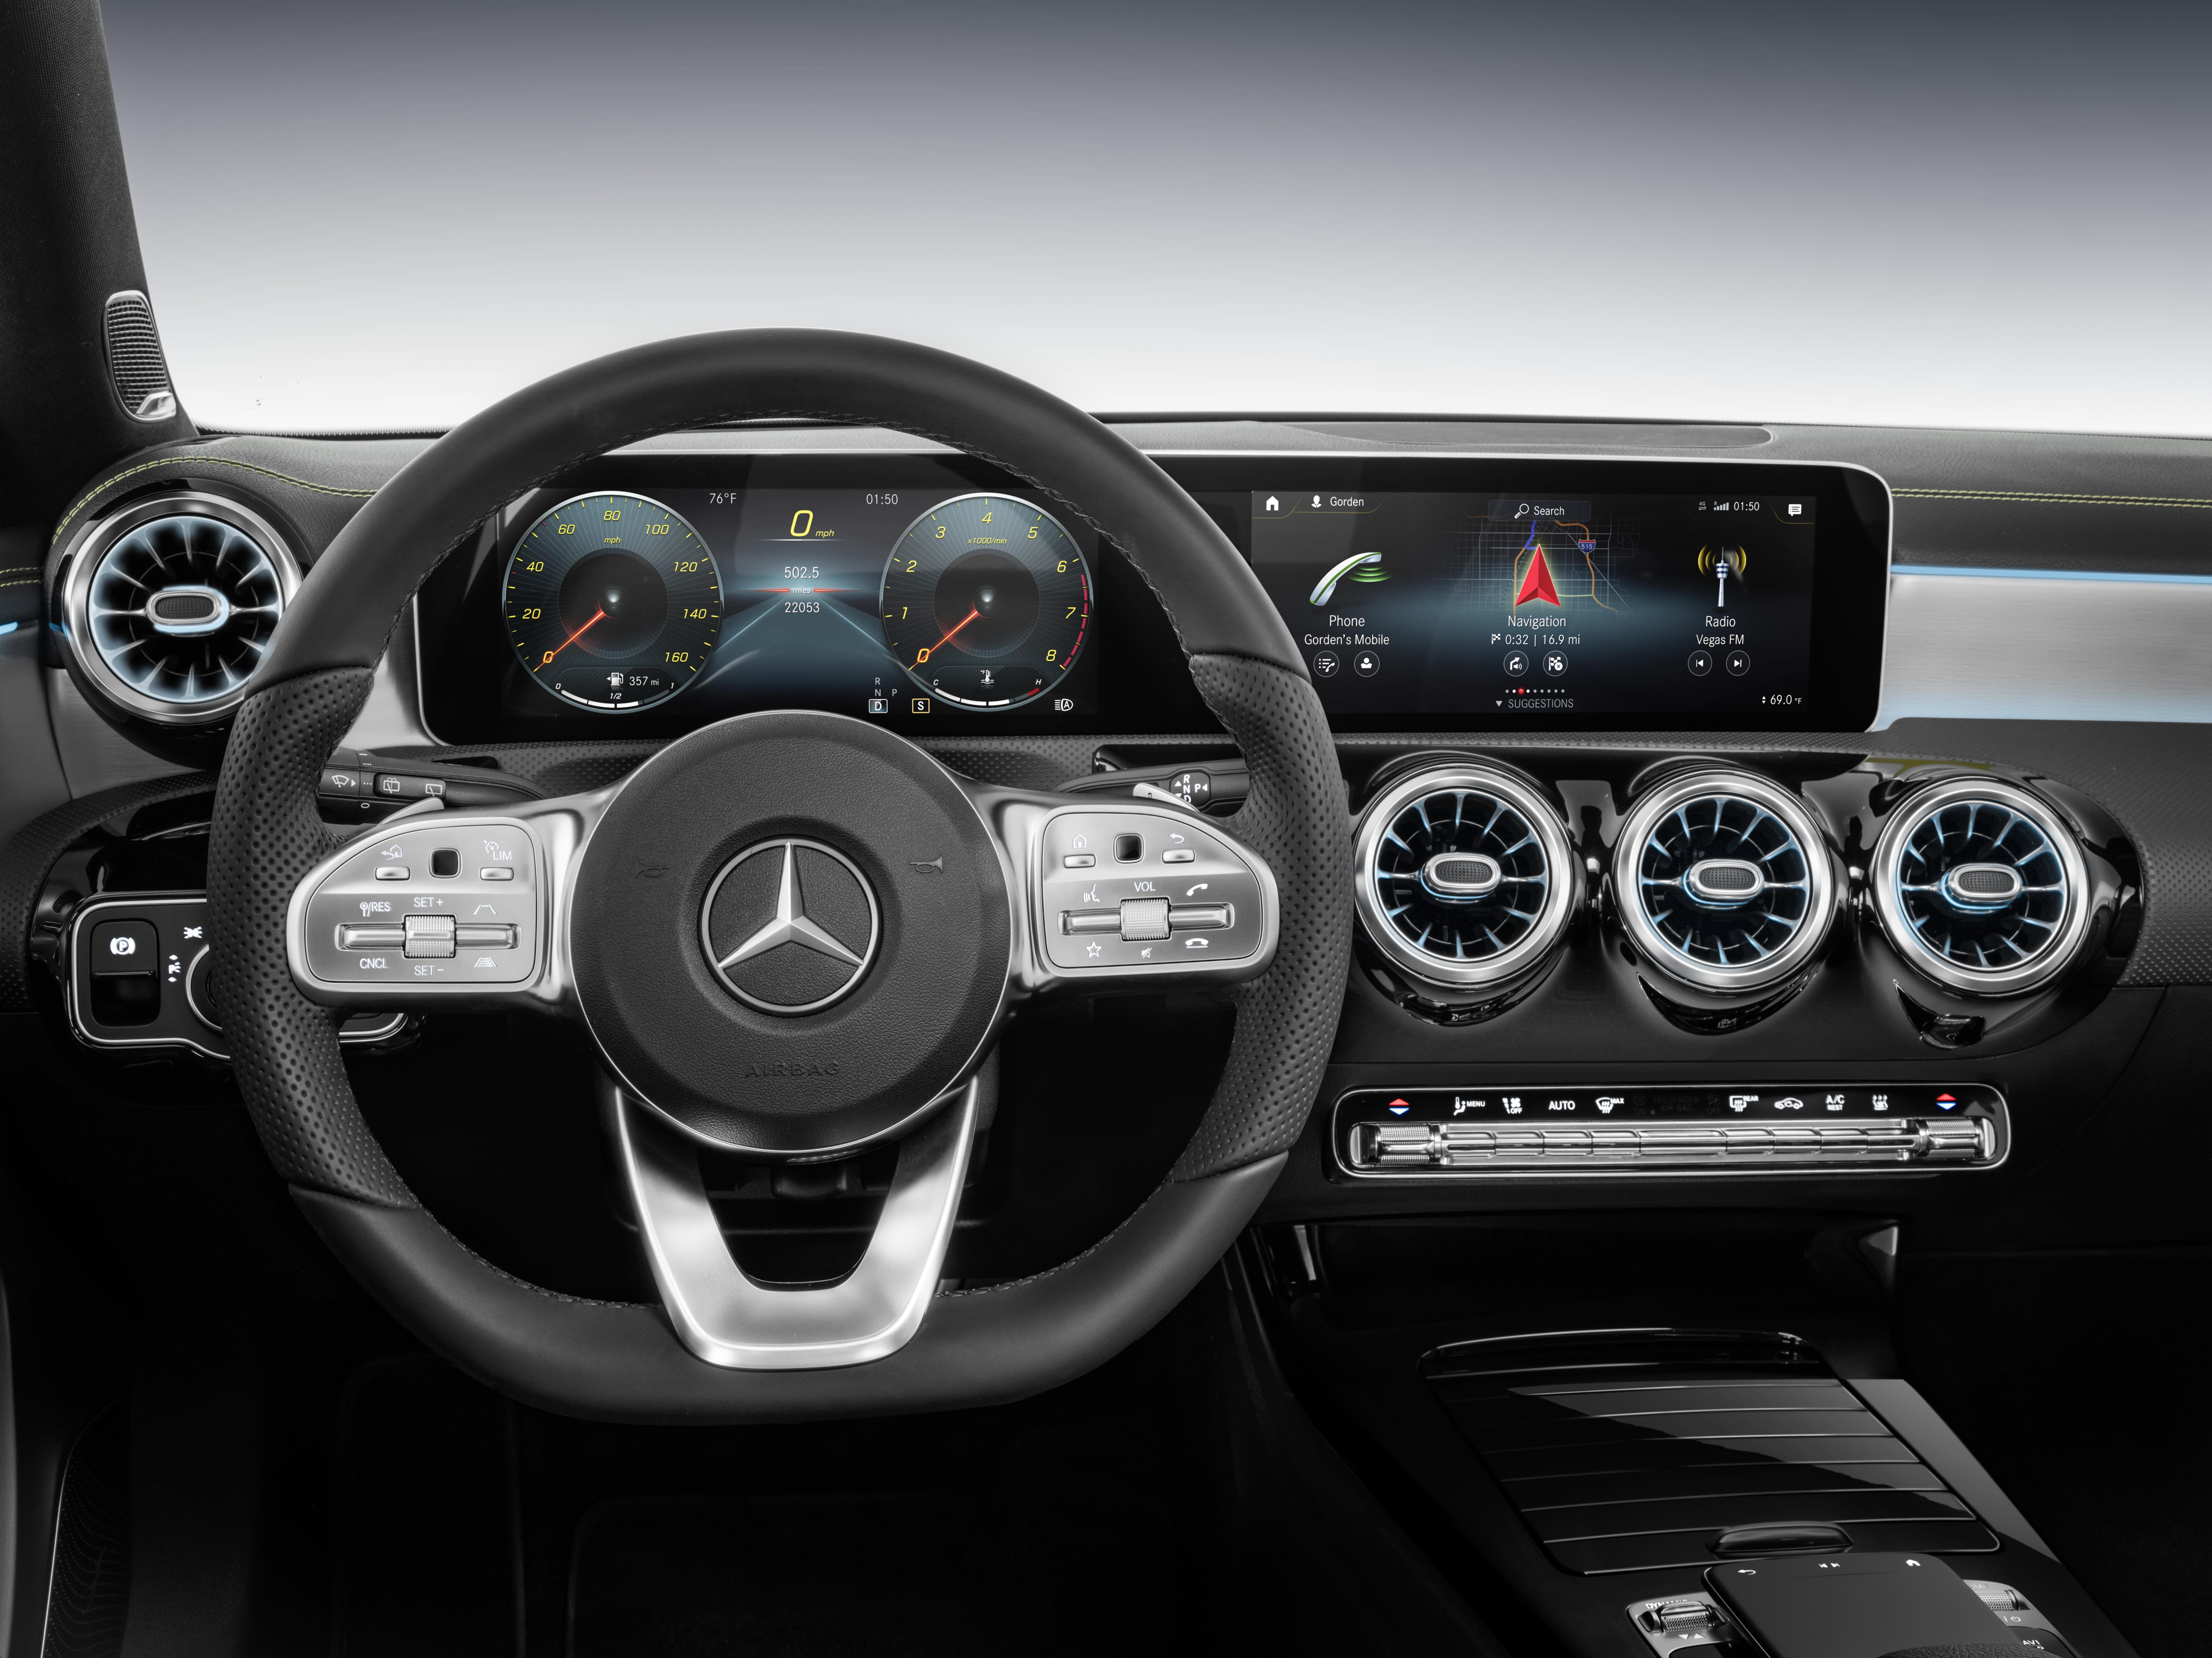 Mercedes Classe A 2018 prezzi listino